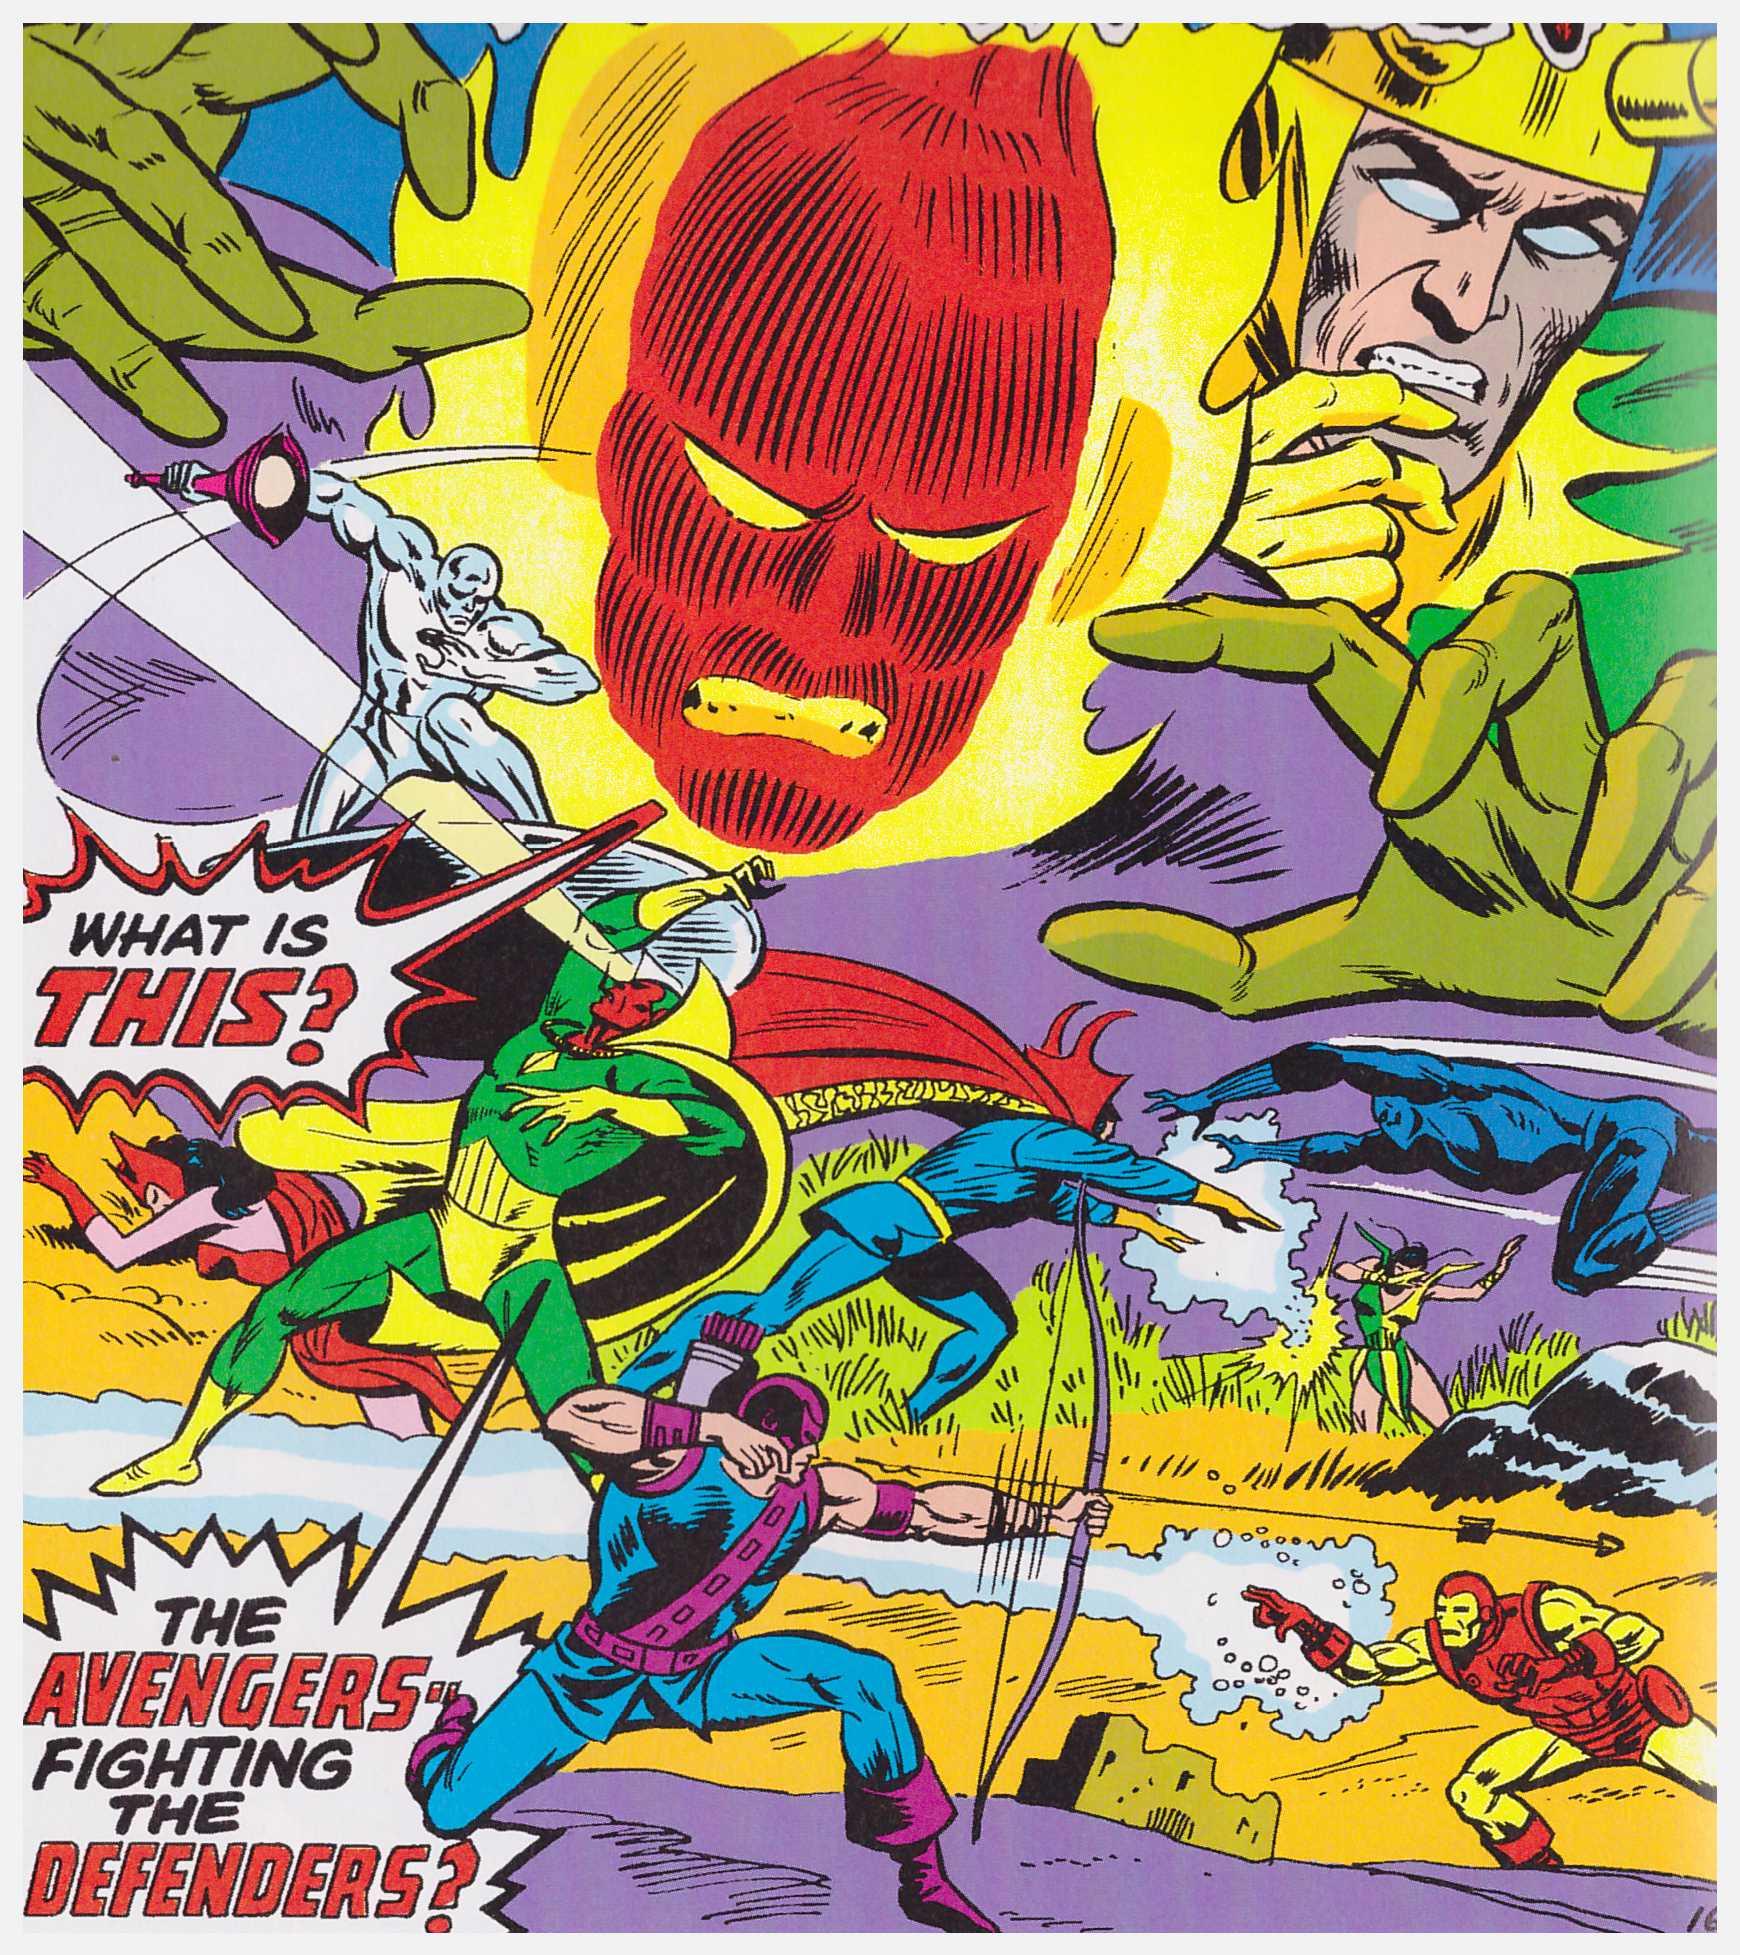 Avengers Defenders War review